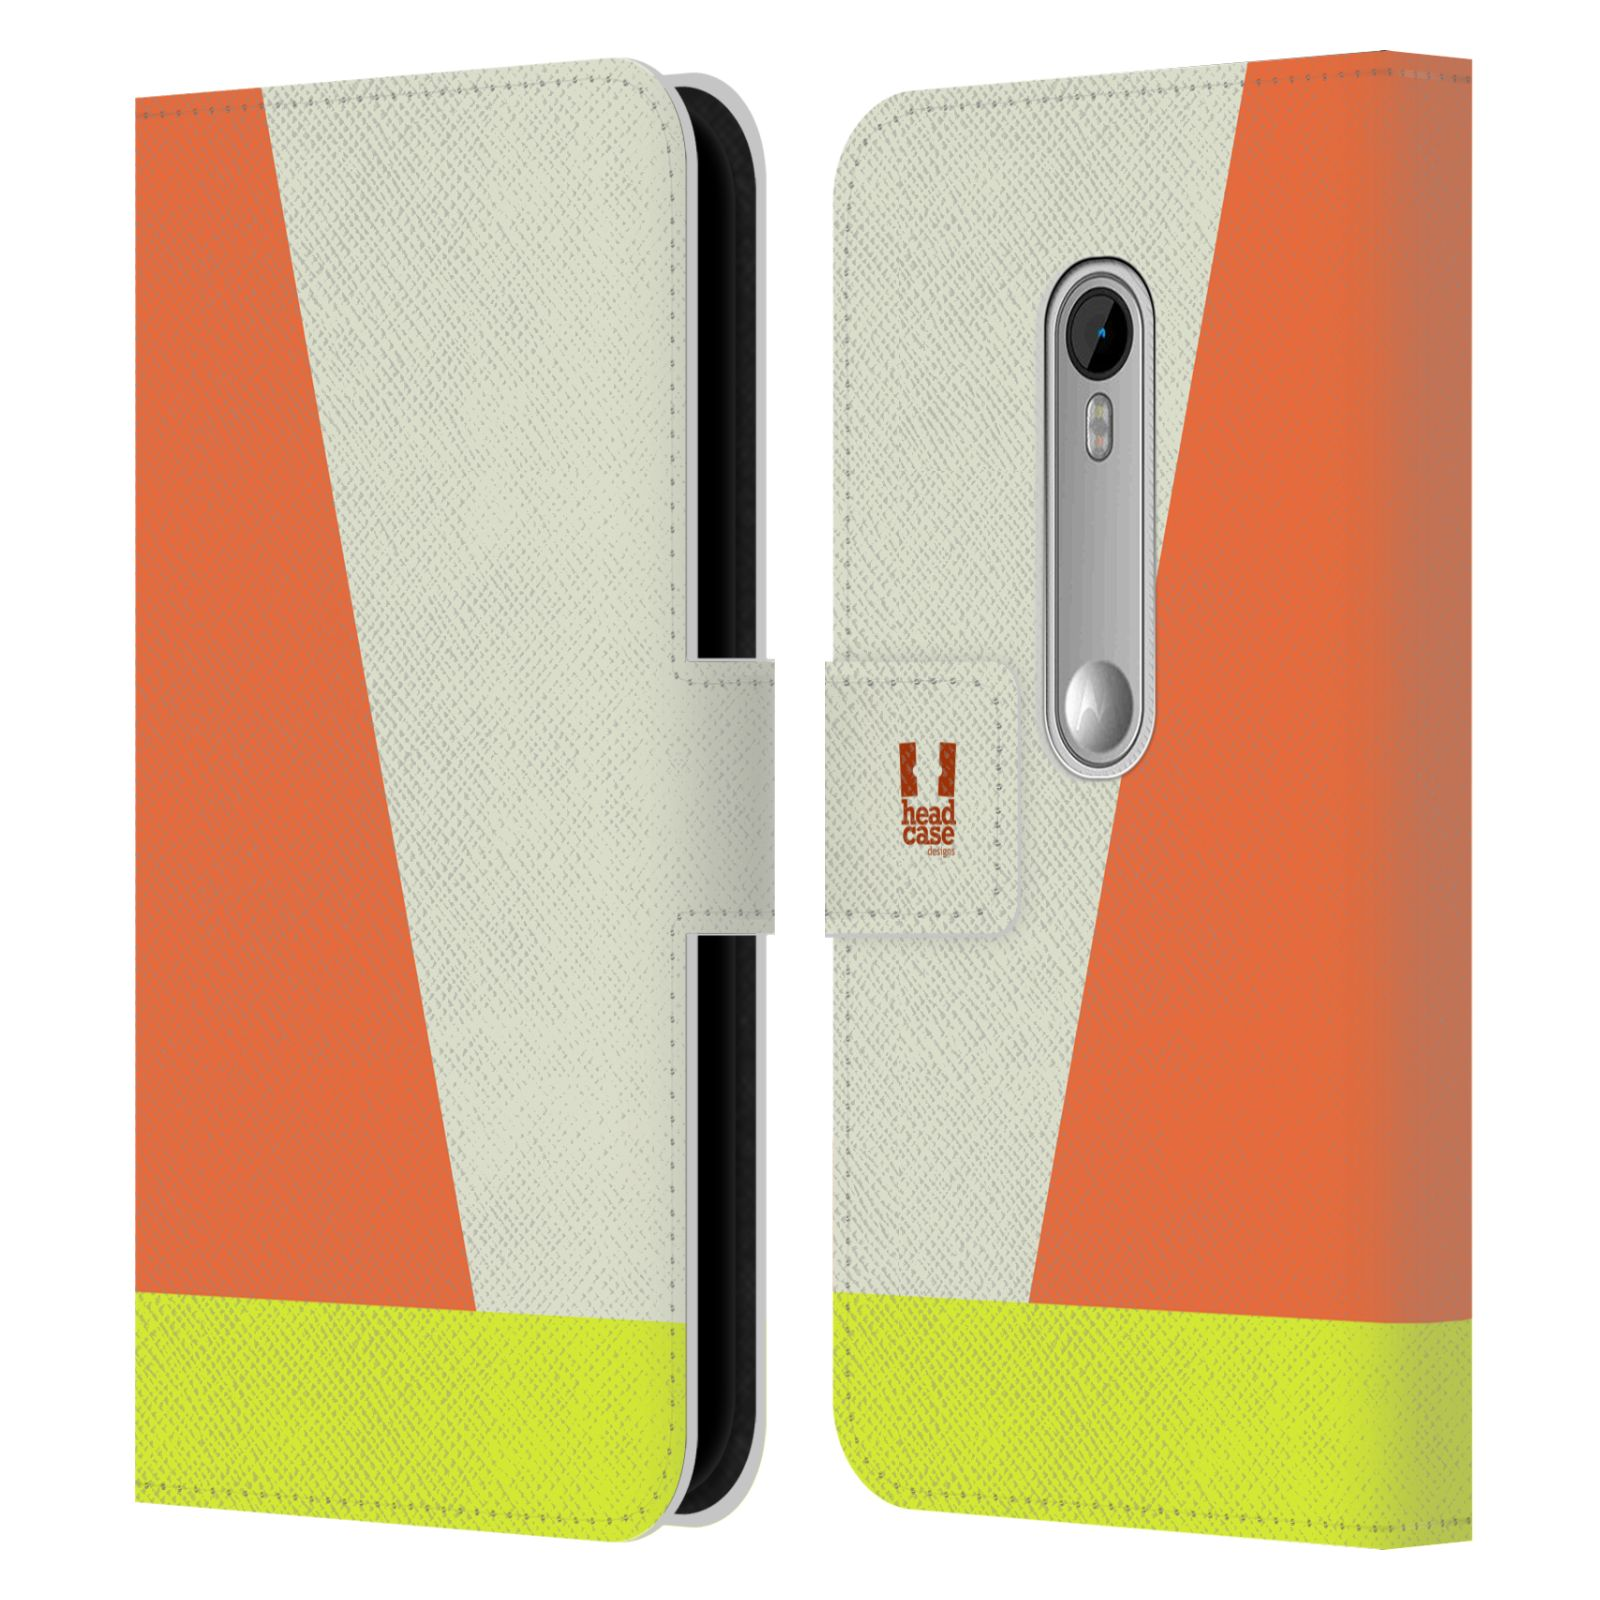 HEAD CASE Flipové pouzdro pro mobil Motorola MOTO G 3RD GENERATION barevné tvary slonová kost